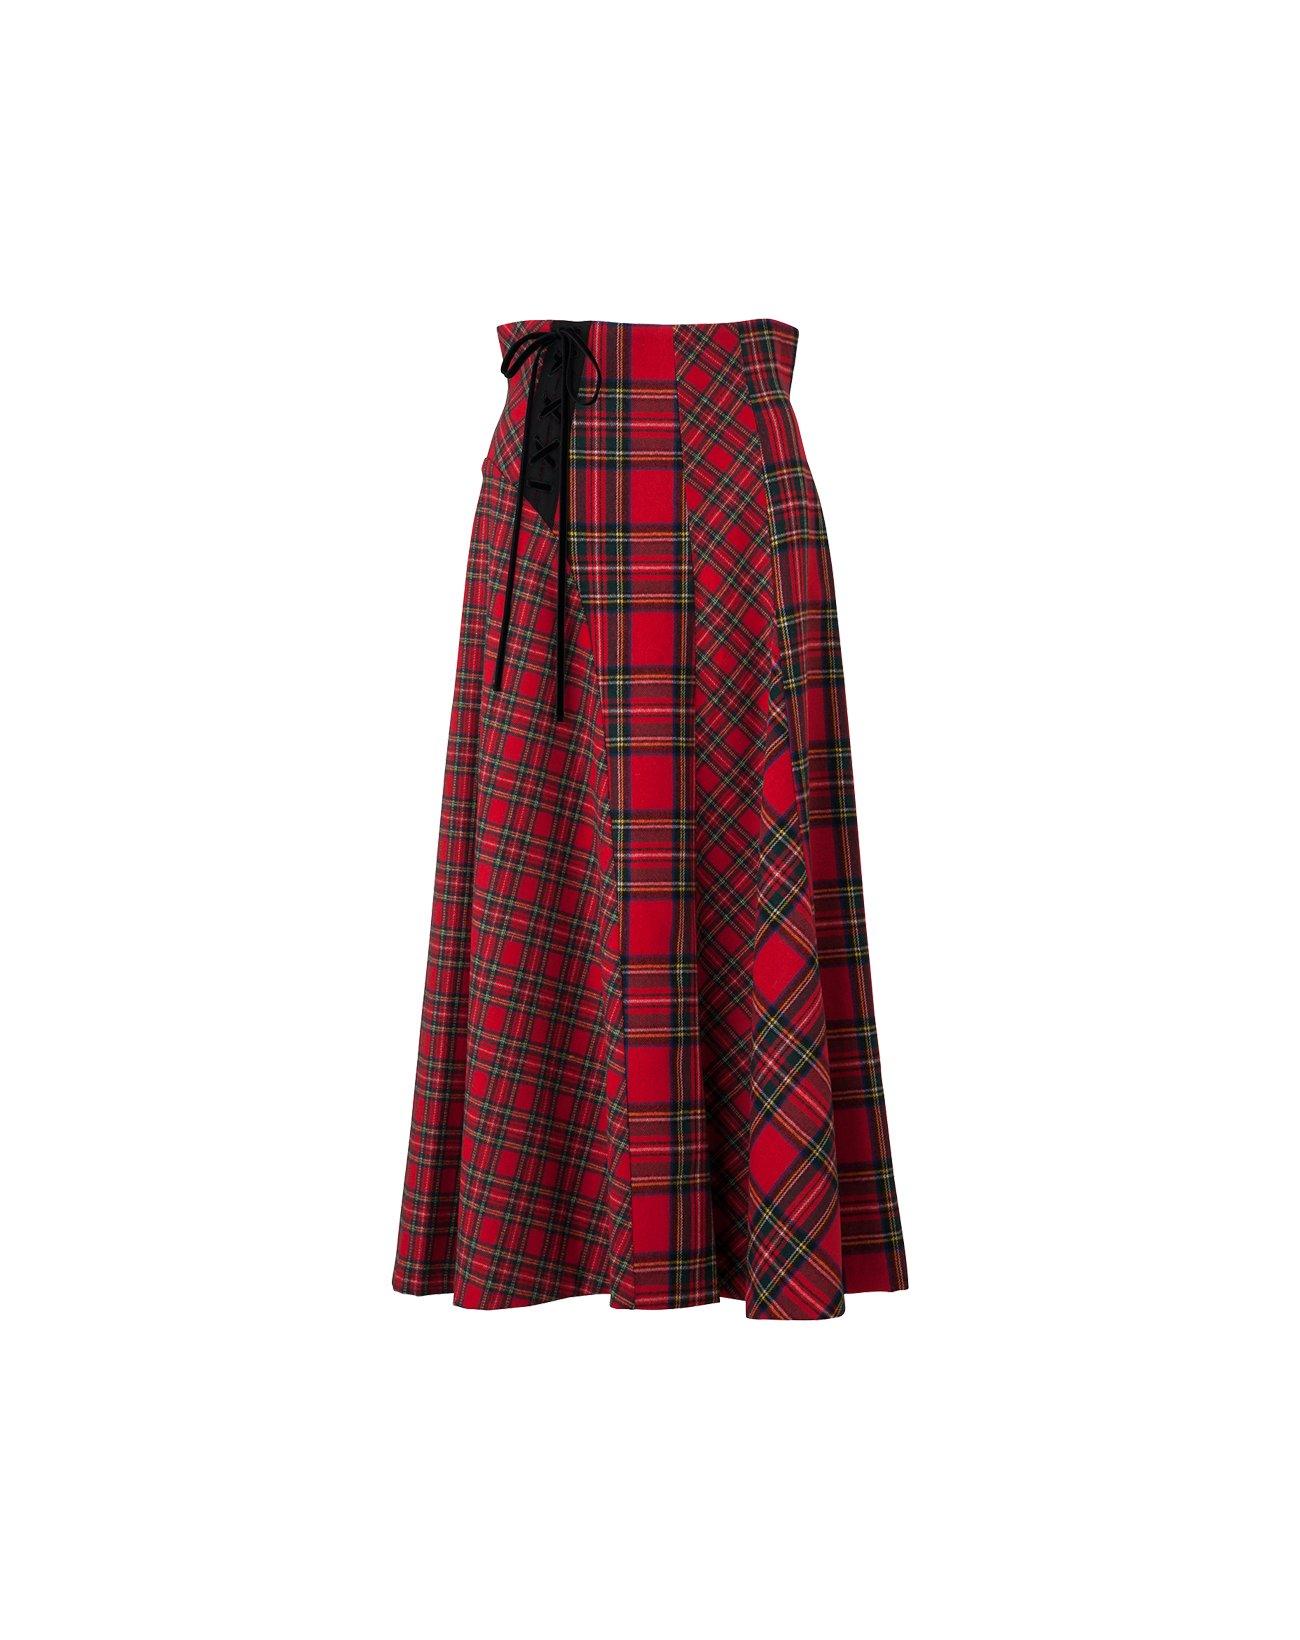 Tartan Check Skirt  - Red